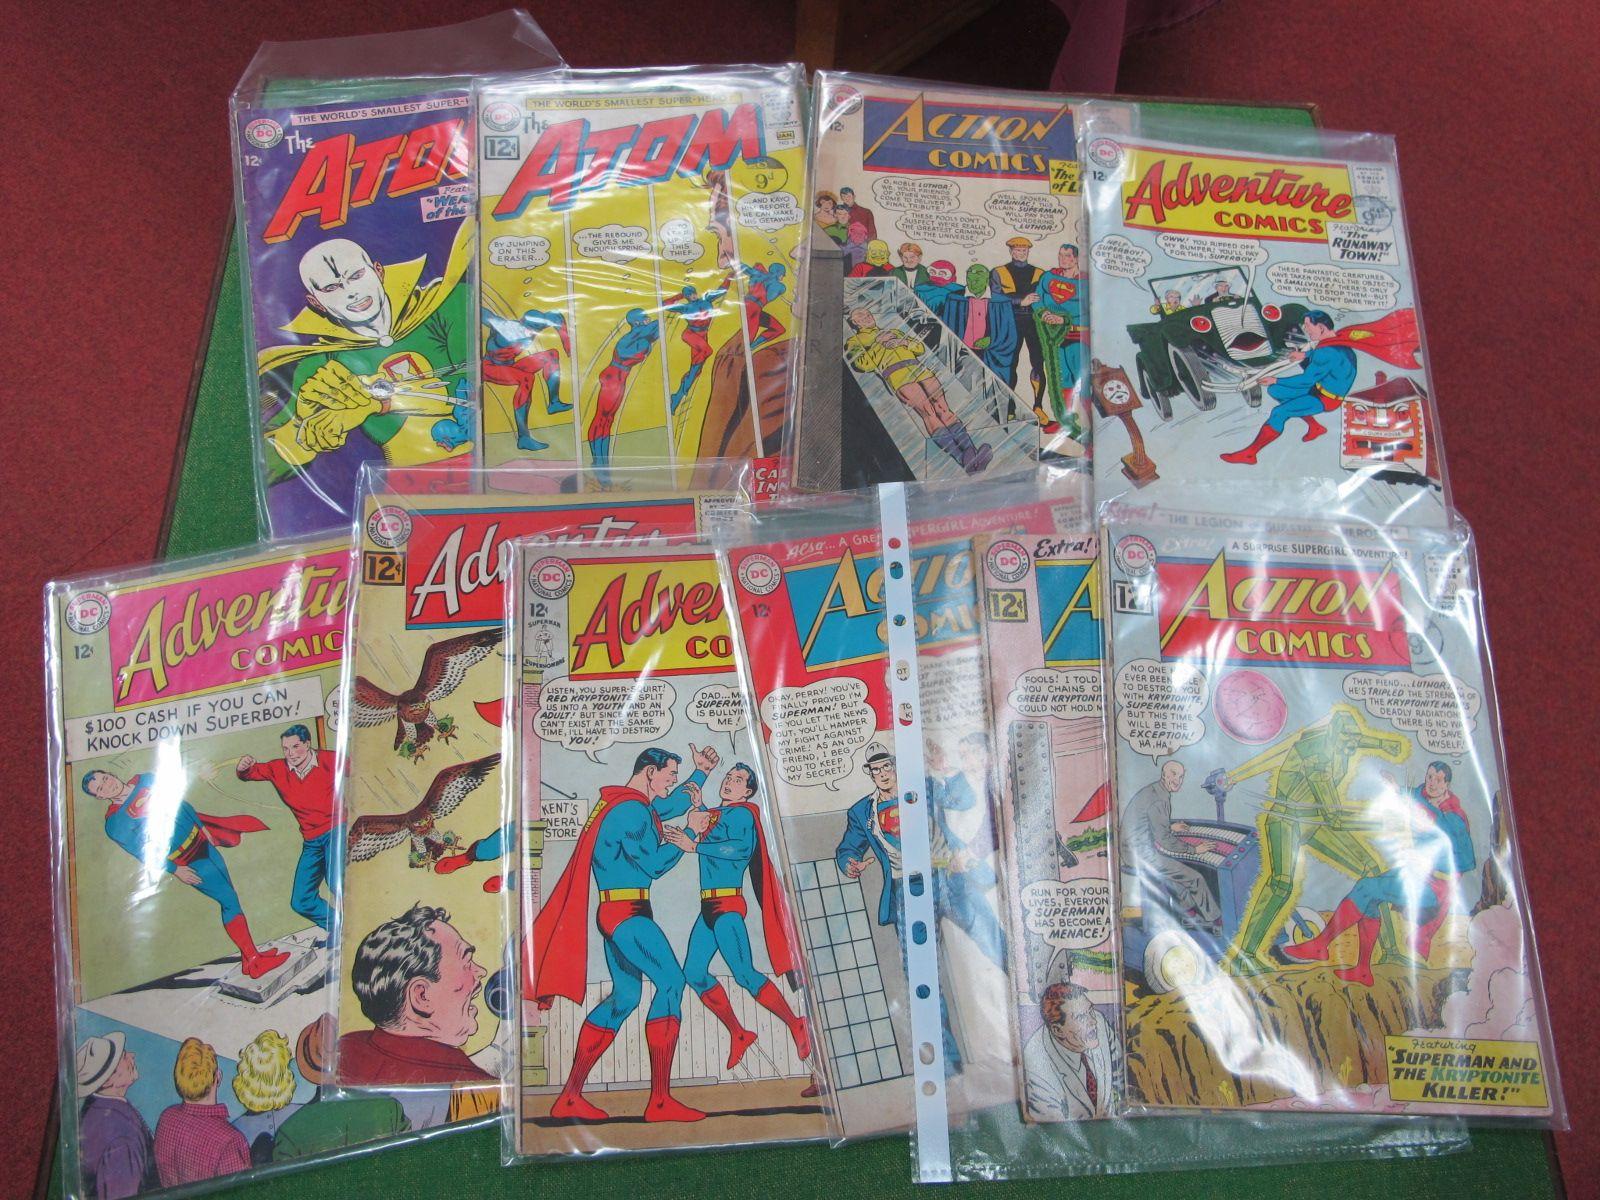 Ten DC Comics, comprising Action Comics #294, #295, #297, #304, #103, #306, #318 and The Atom #13